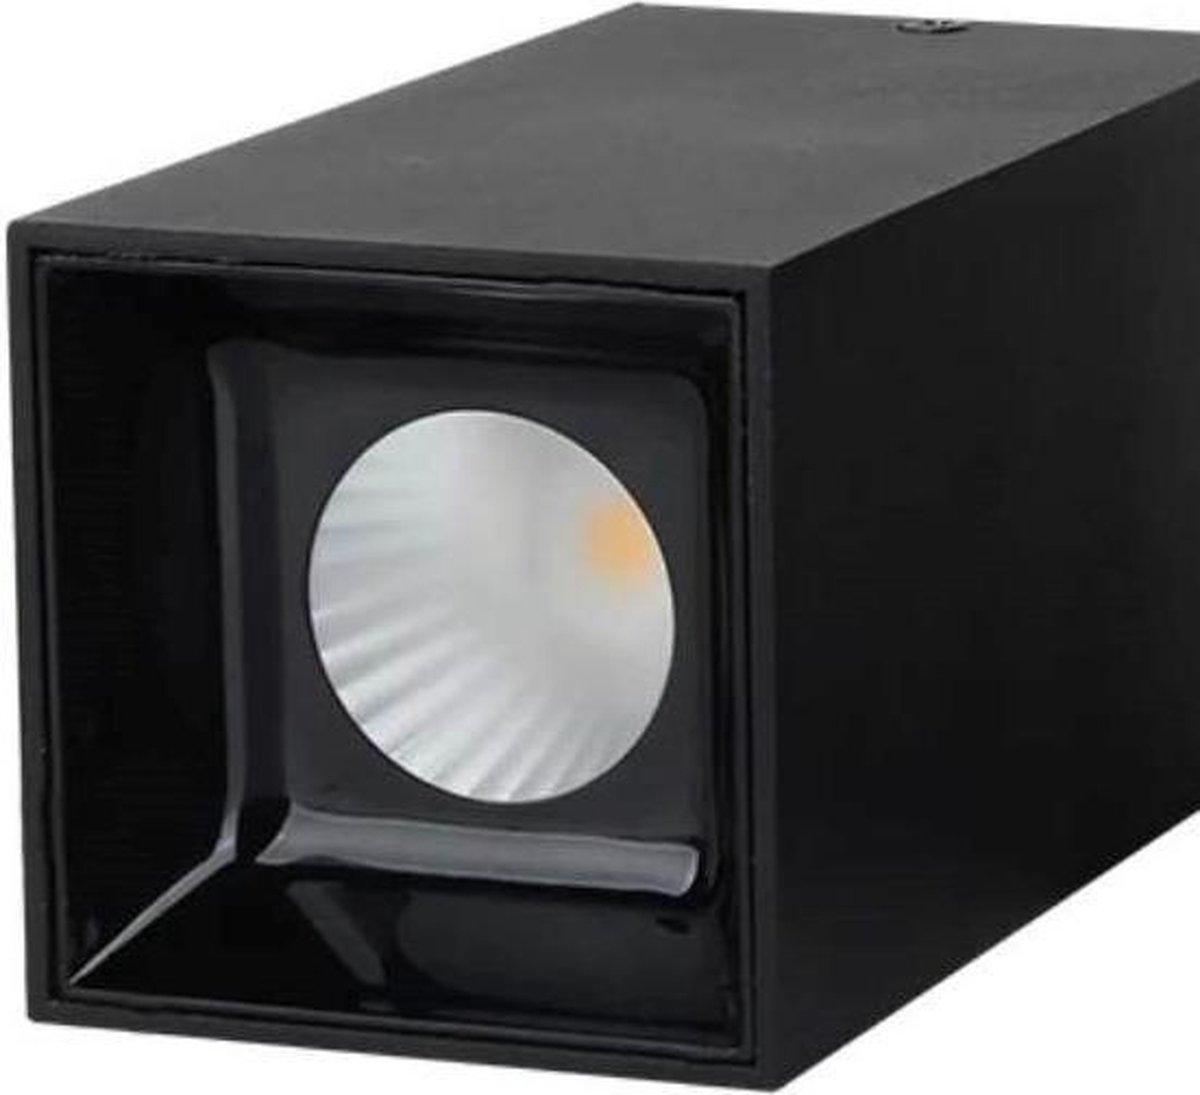 ABC | Opbouwspot enkel - Vierkant - Zwart - 15W - LED